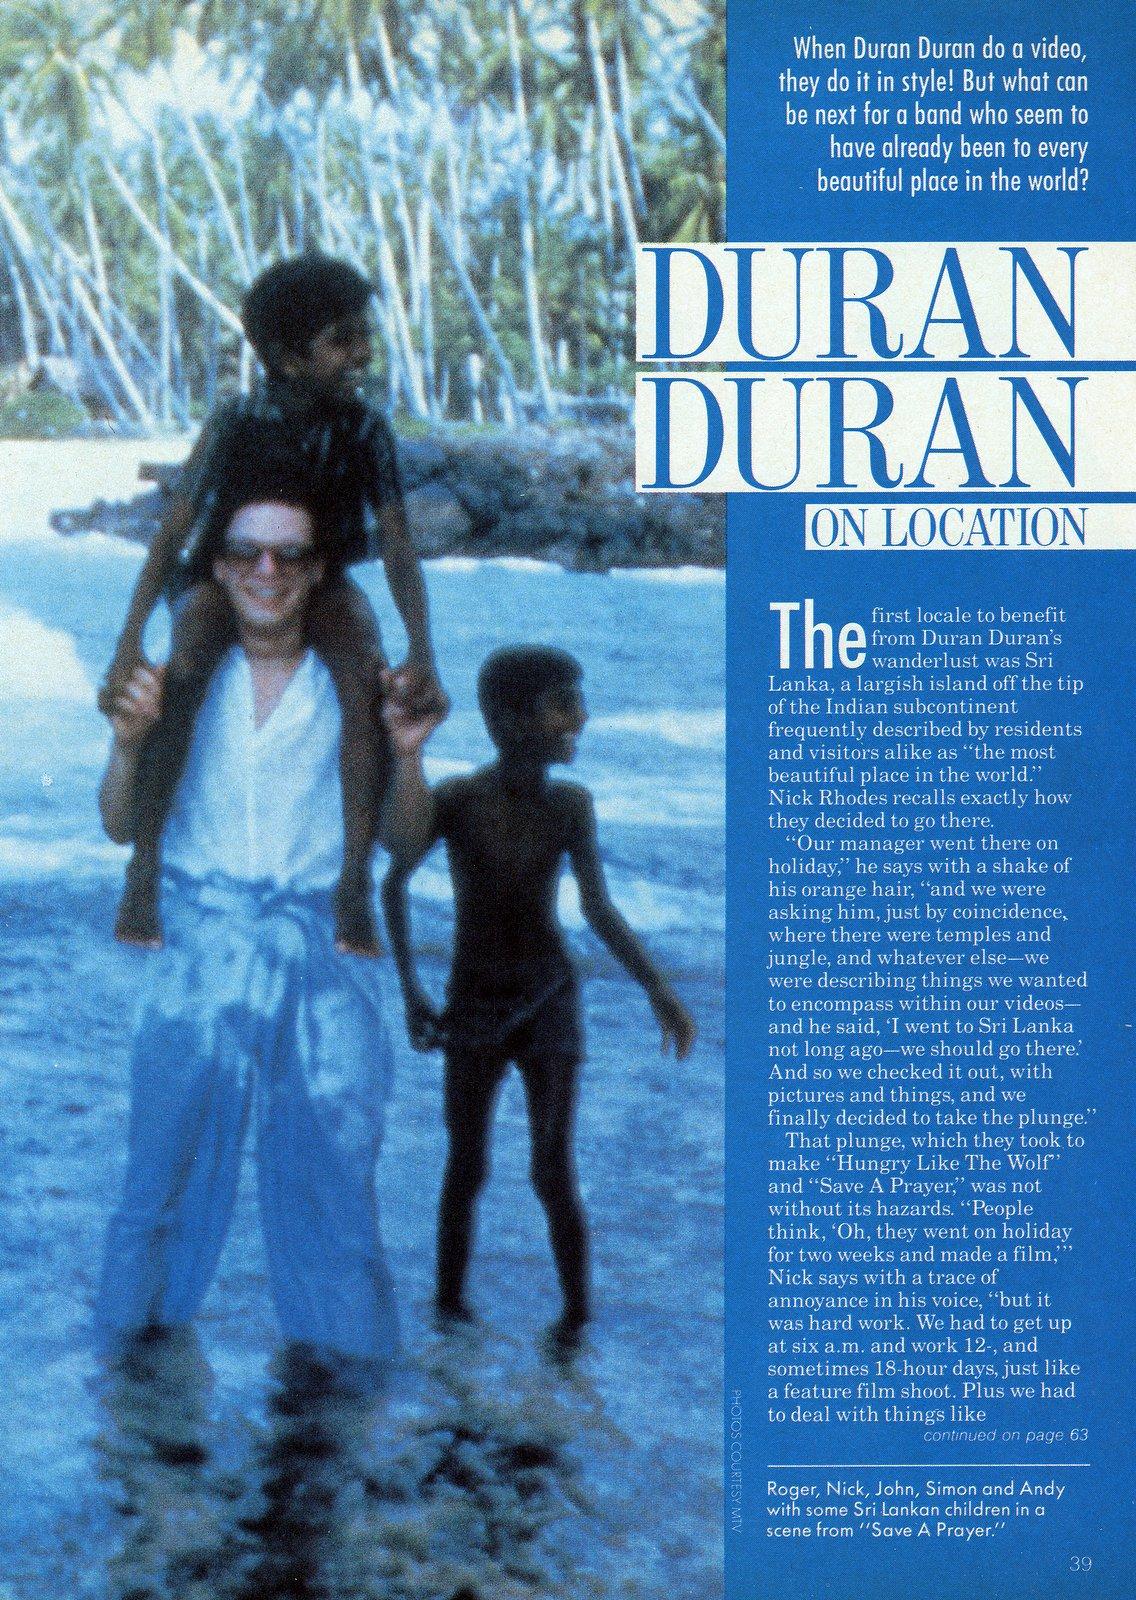 Duran Duran in Sri Lanka to film the Save A Prayer video 1980s (2)